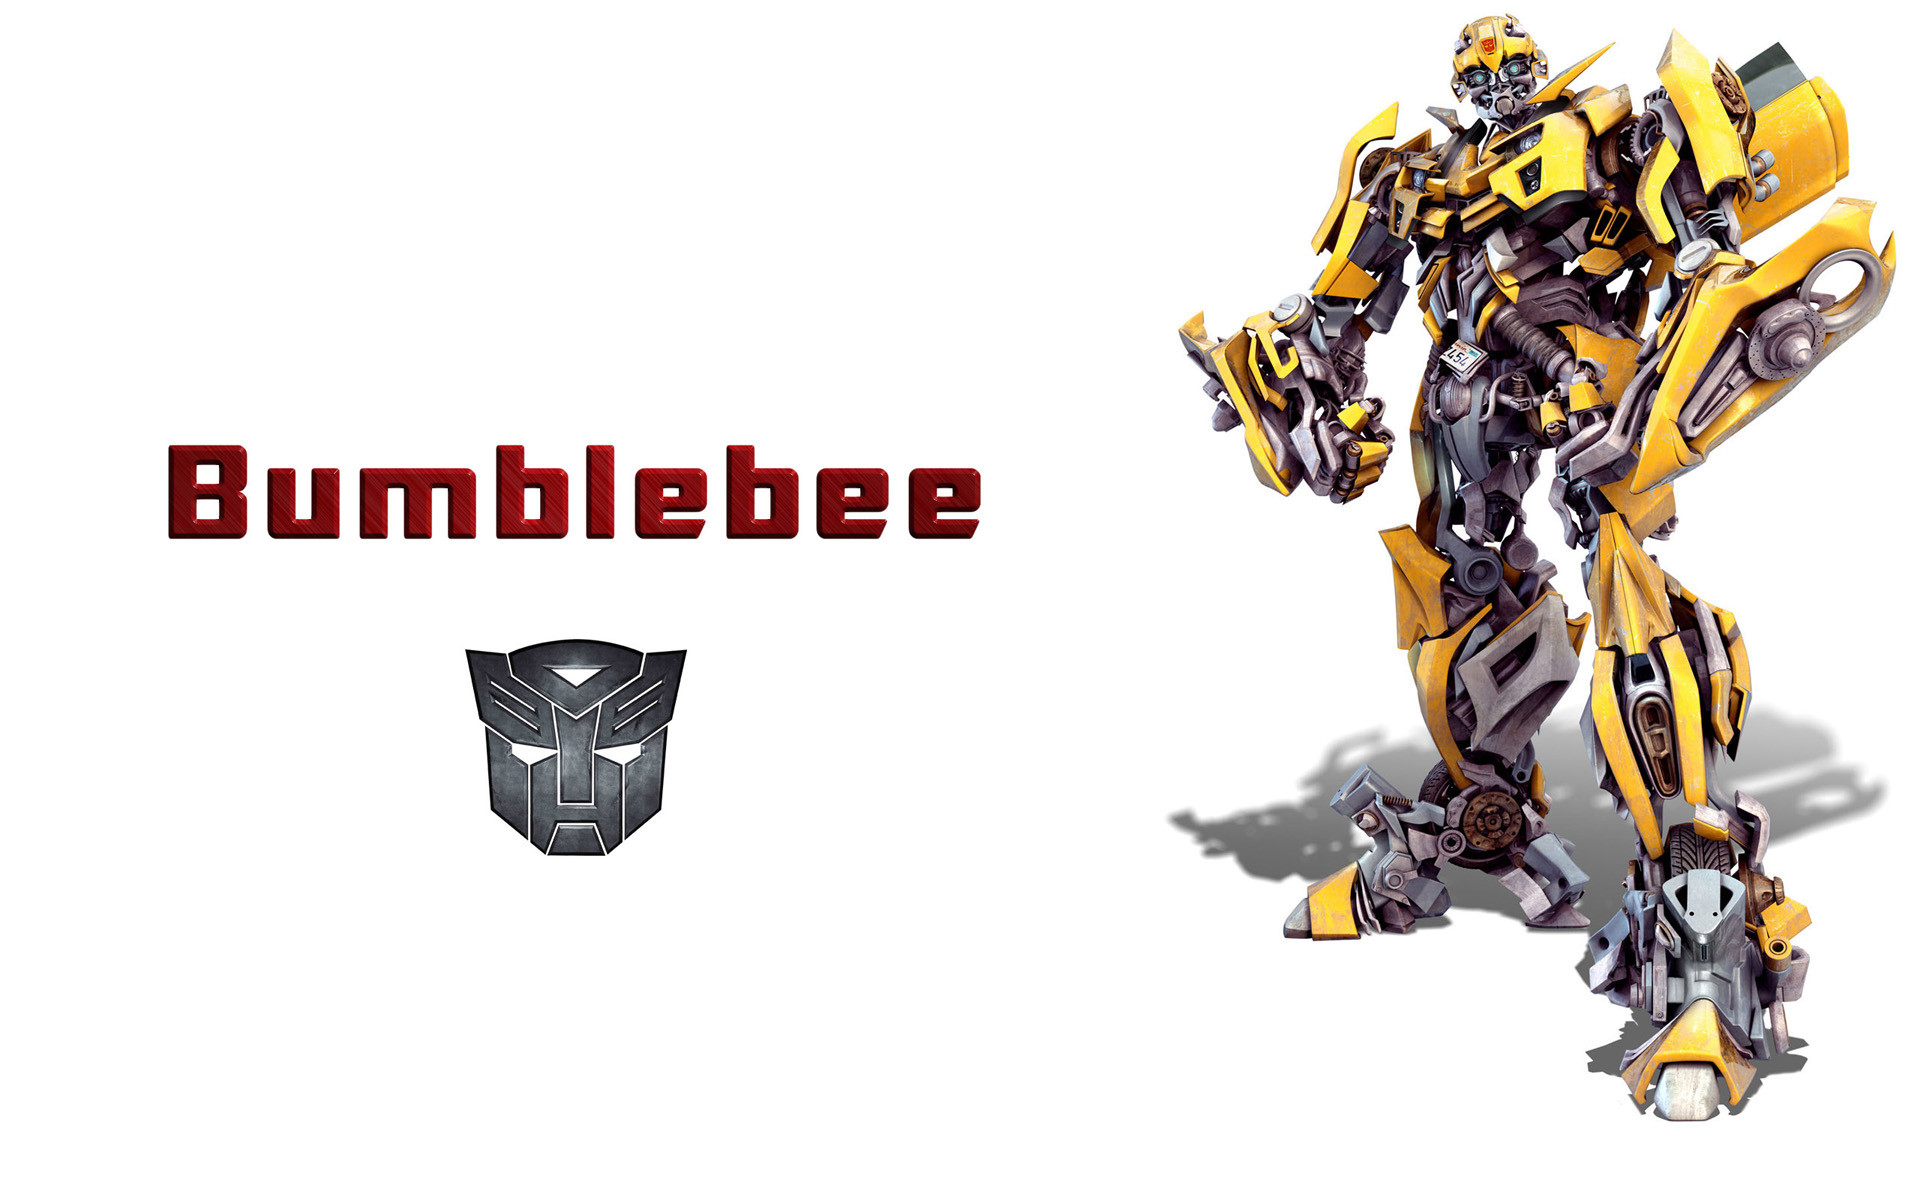 1920x1200 Transformers Bumblebee Nail Look